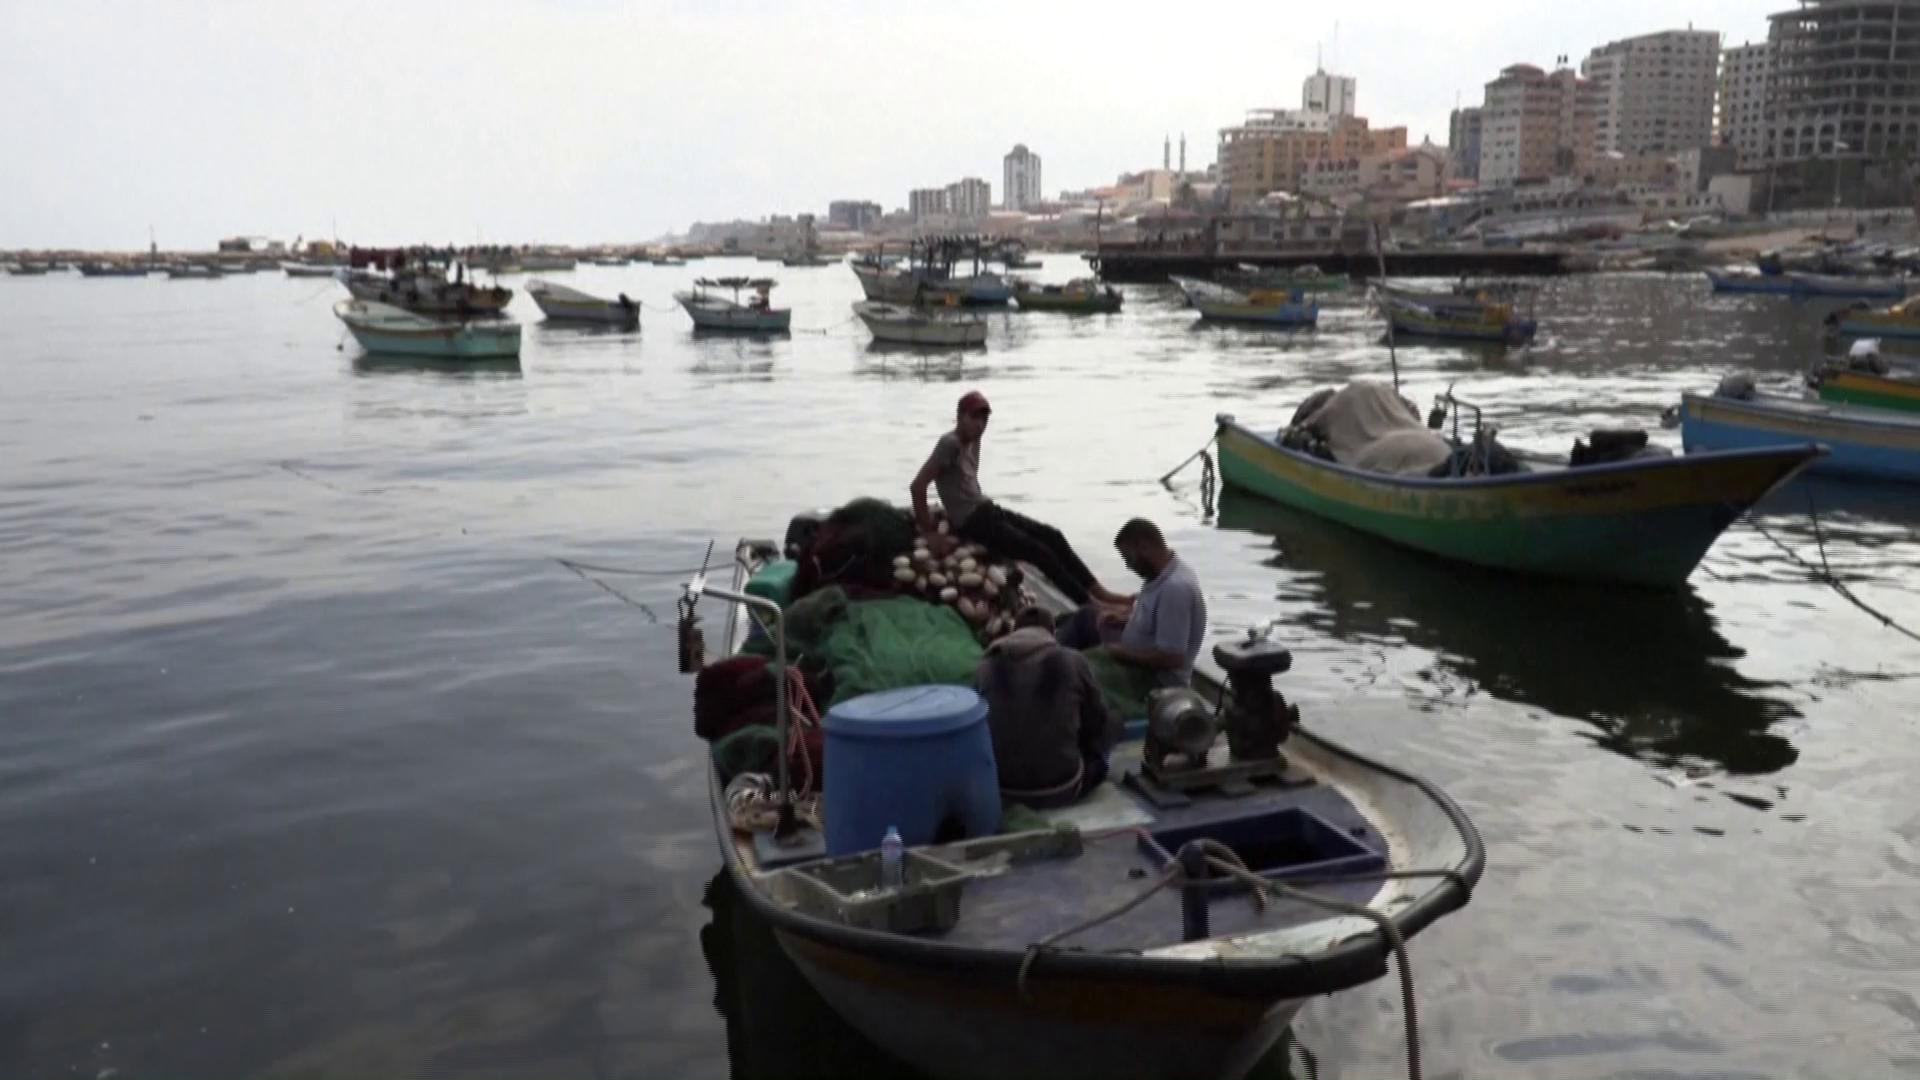 Israel reduces Gaza fishing zone